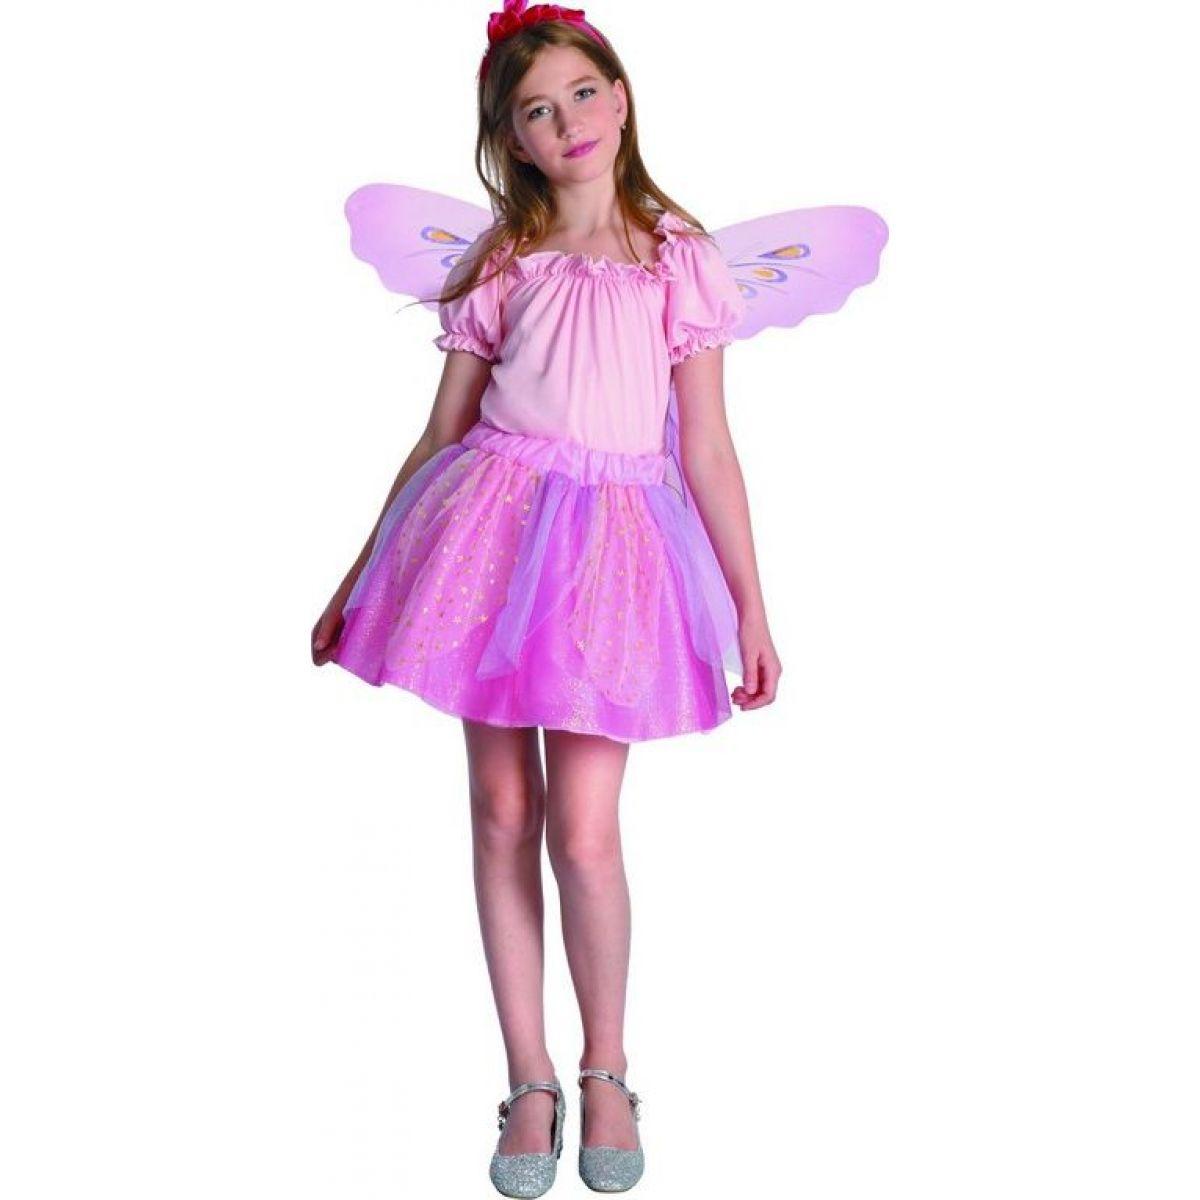 Dětský karnevalový kostým Víla 110-120 cm